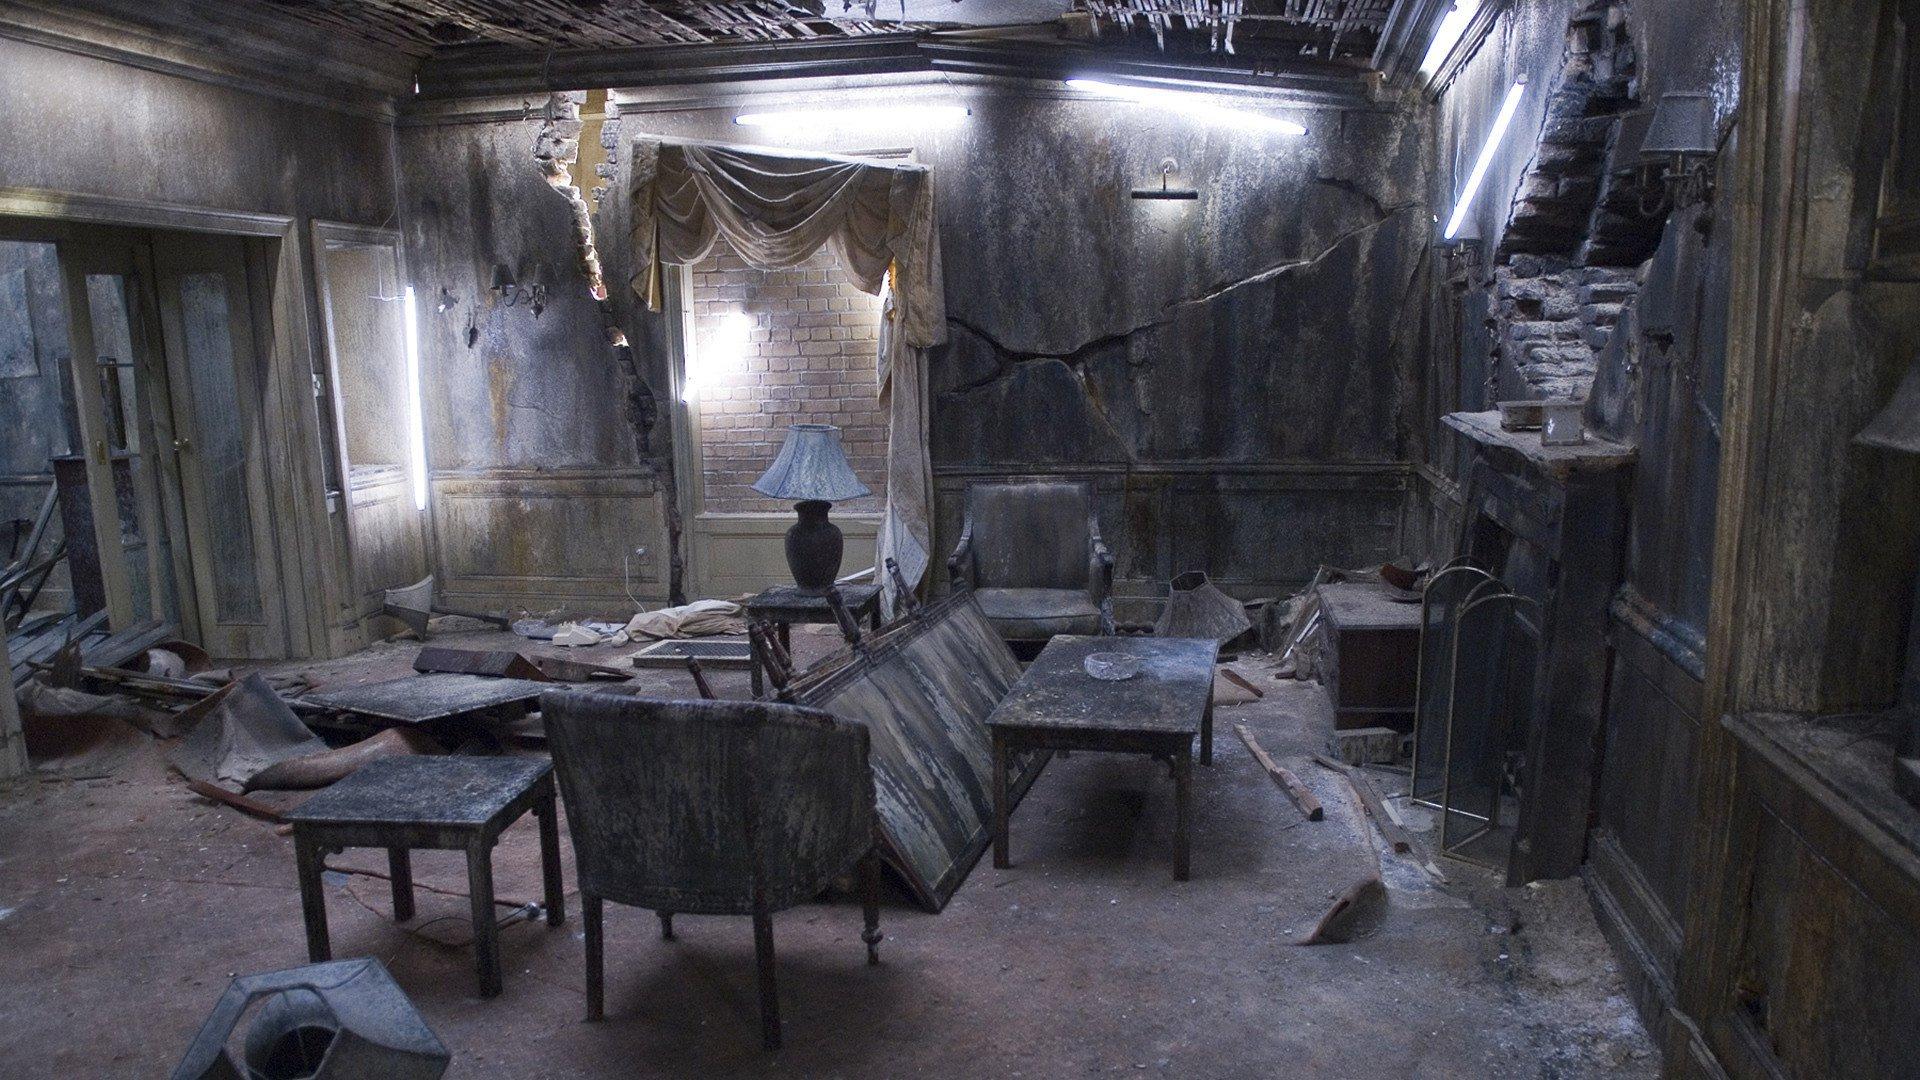 Chambre 1408 - Films-horreur.com Stephen Paddock